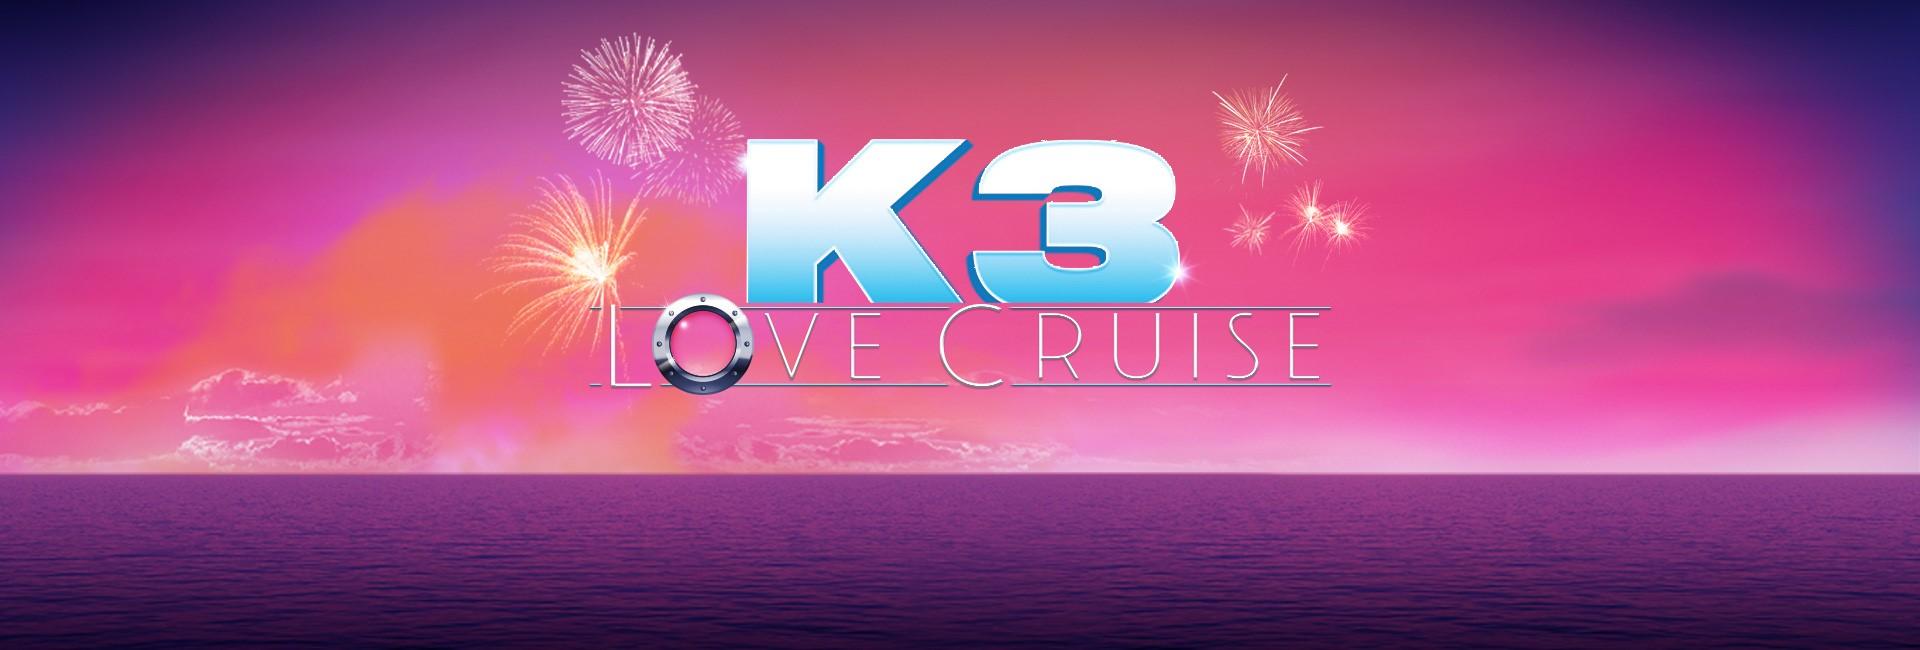 K3 Love Cruise Header